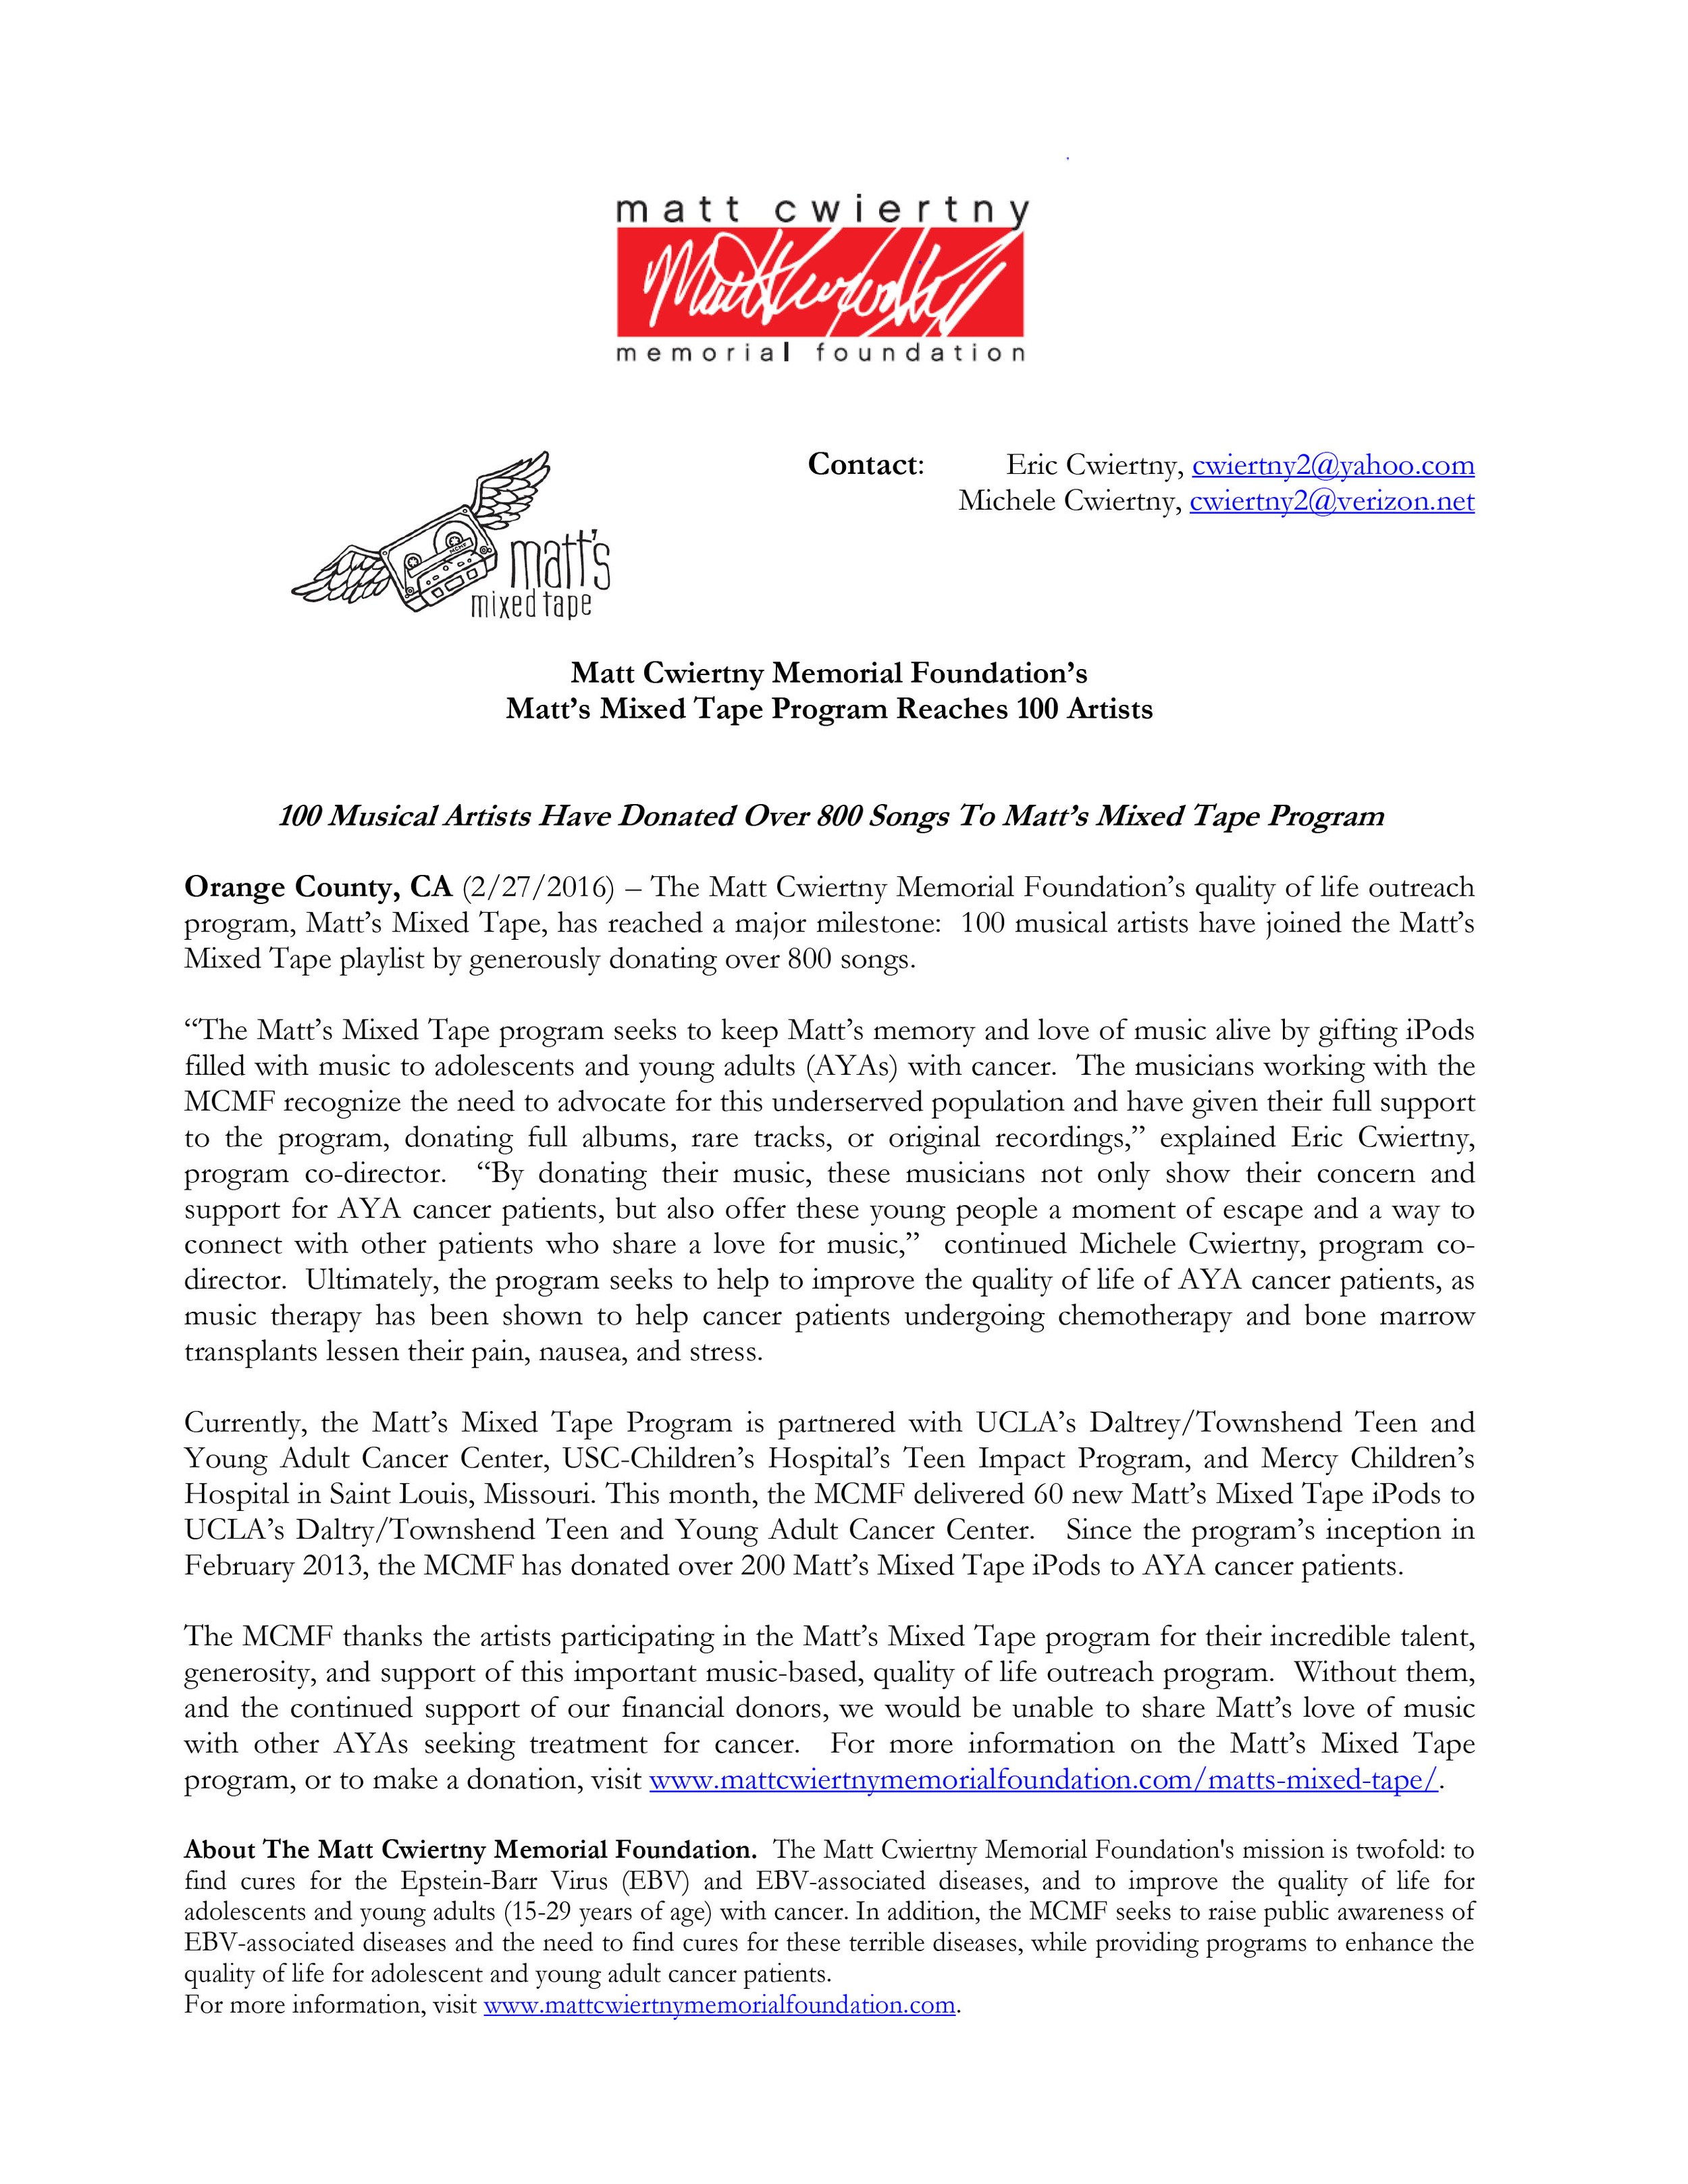 2016-2-29 - MCMF Press Release - Matt's Mixed Tape-c.jpg